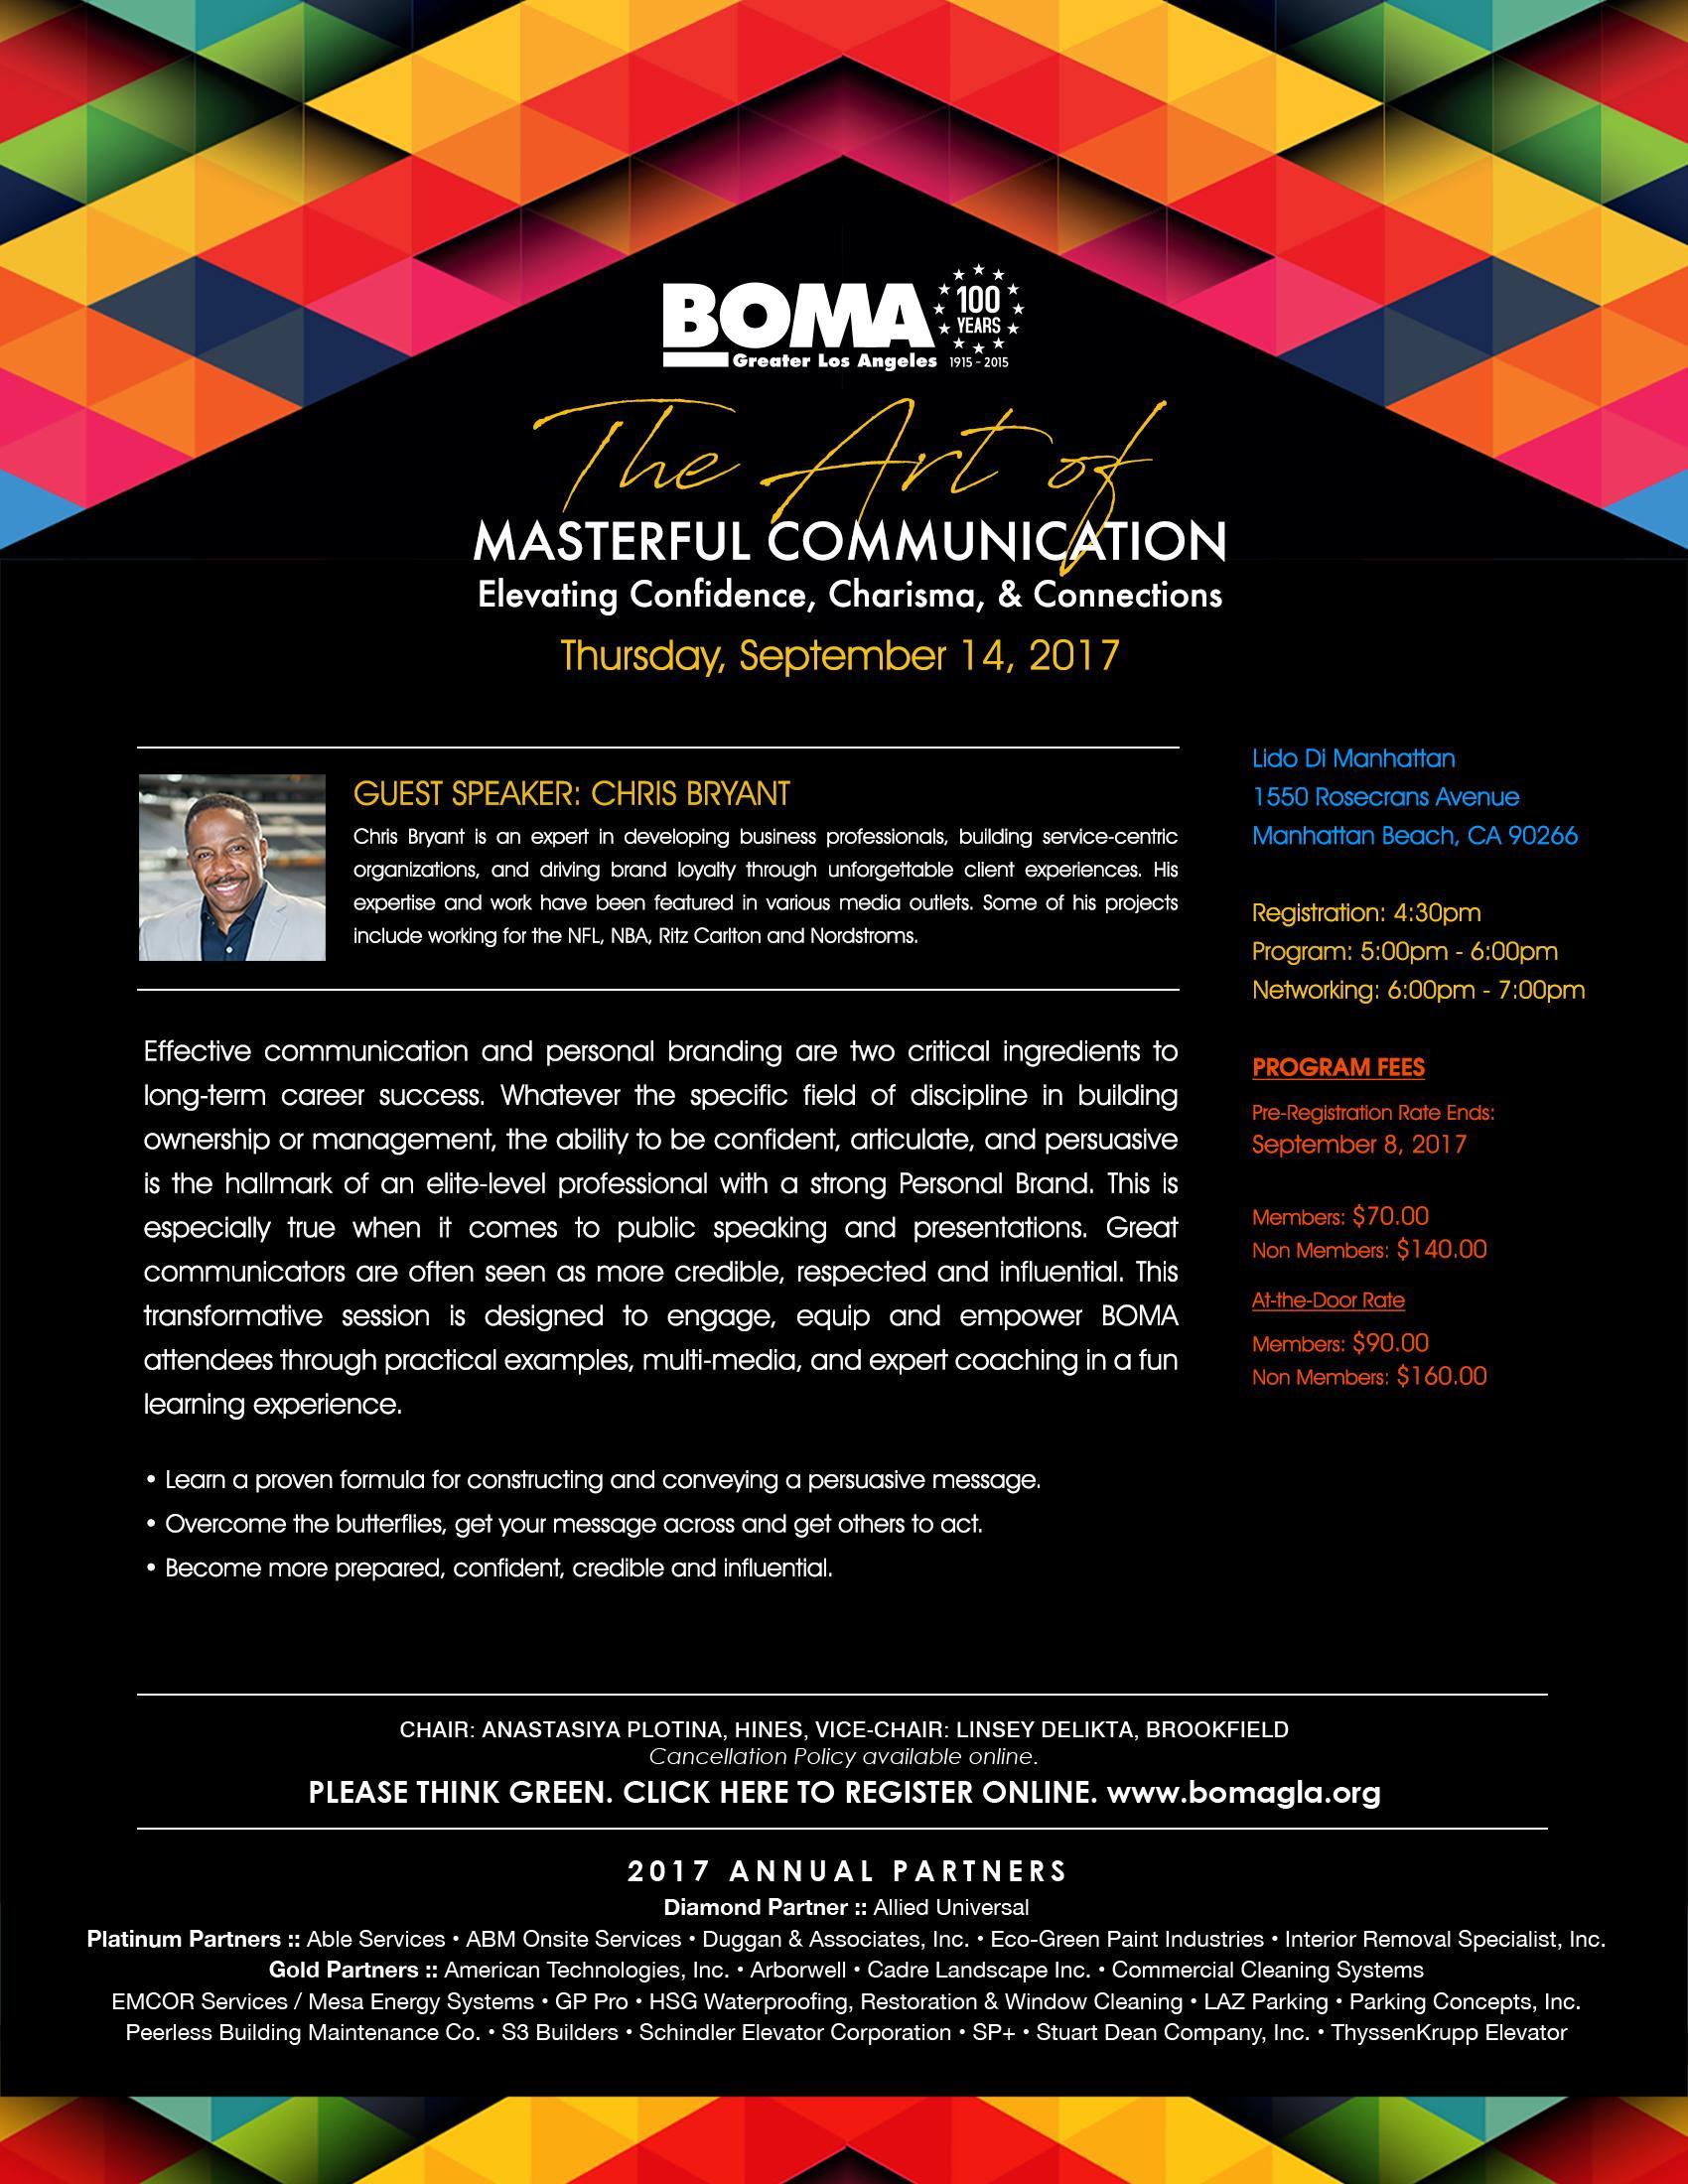 Boma 2017 Excel Spreadsheet Throughout Anastasiya Plotina  Property Manager  Hines  Linkedin